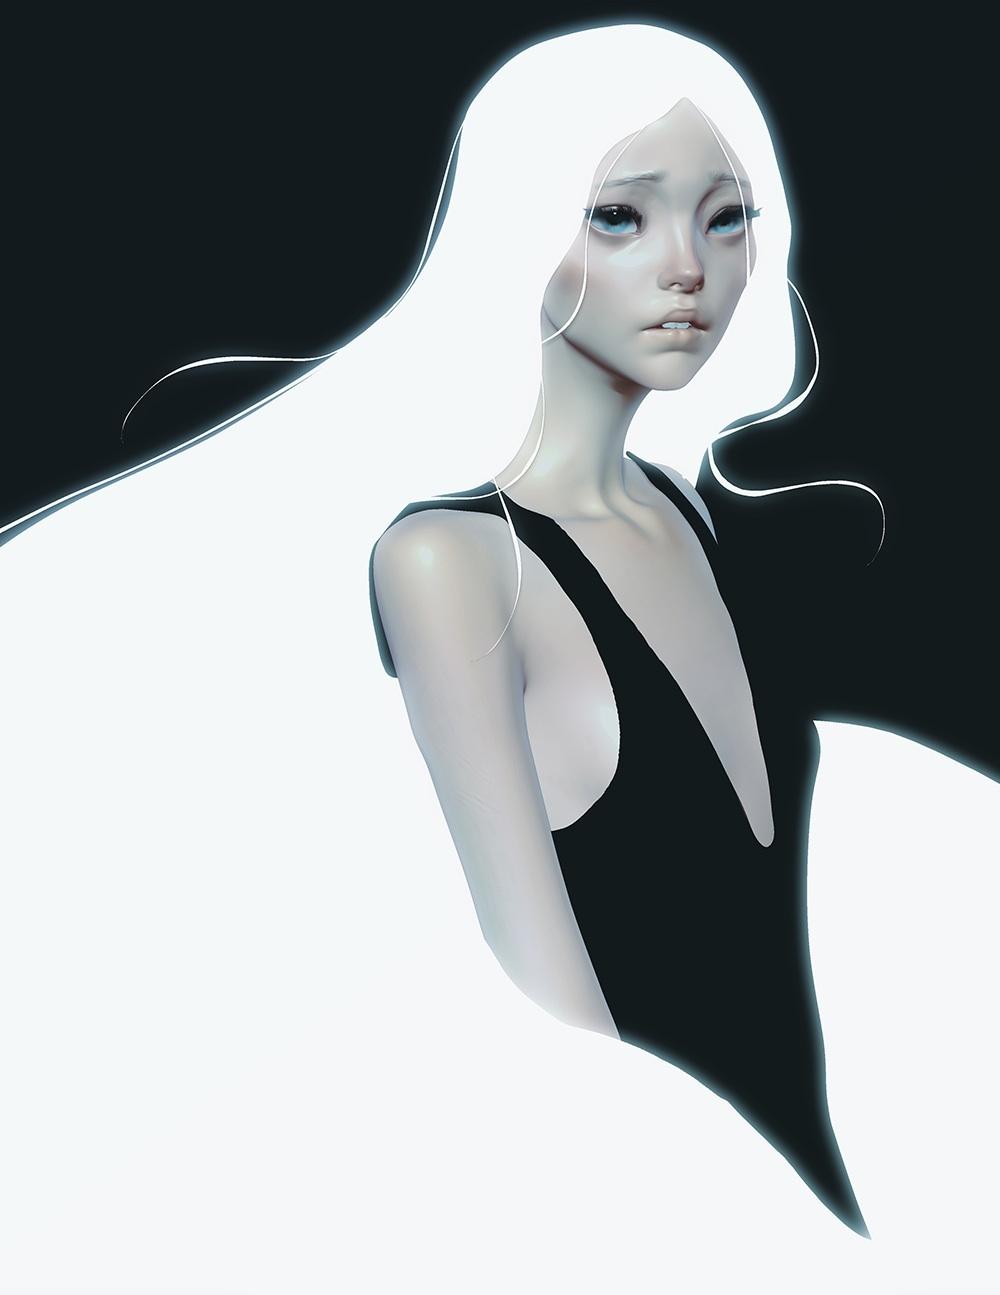 Pure by CezarBrandao